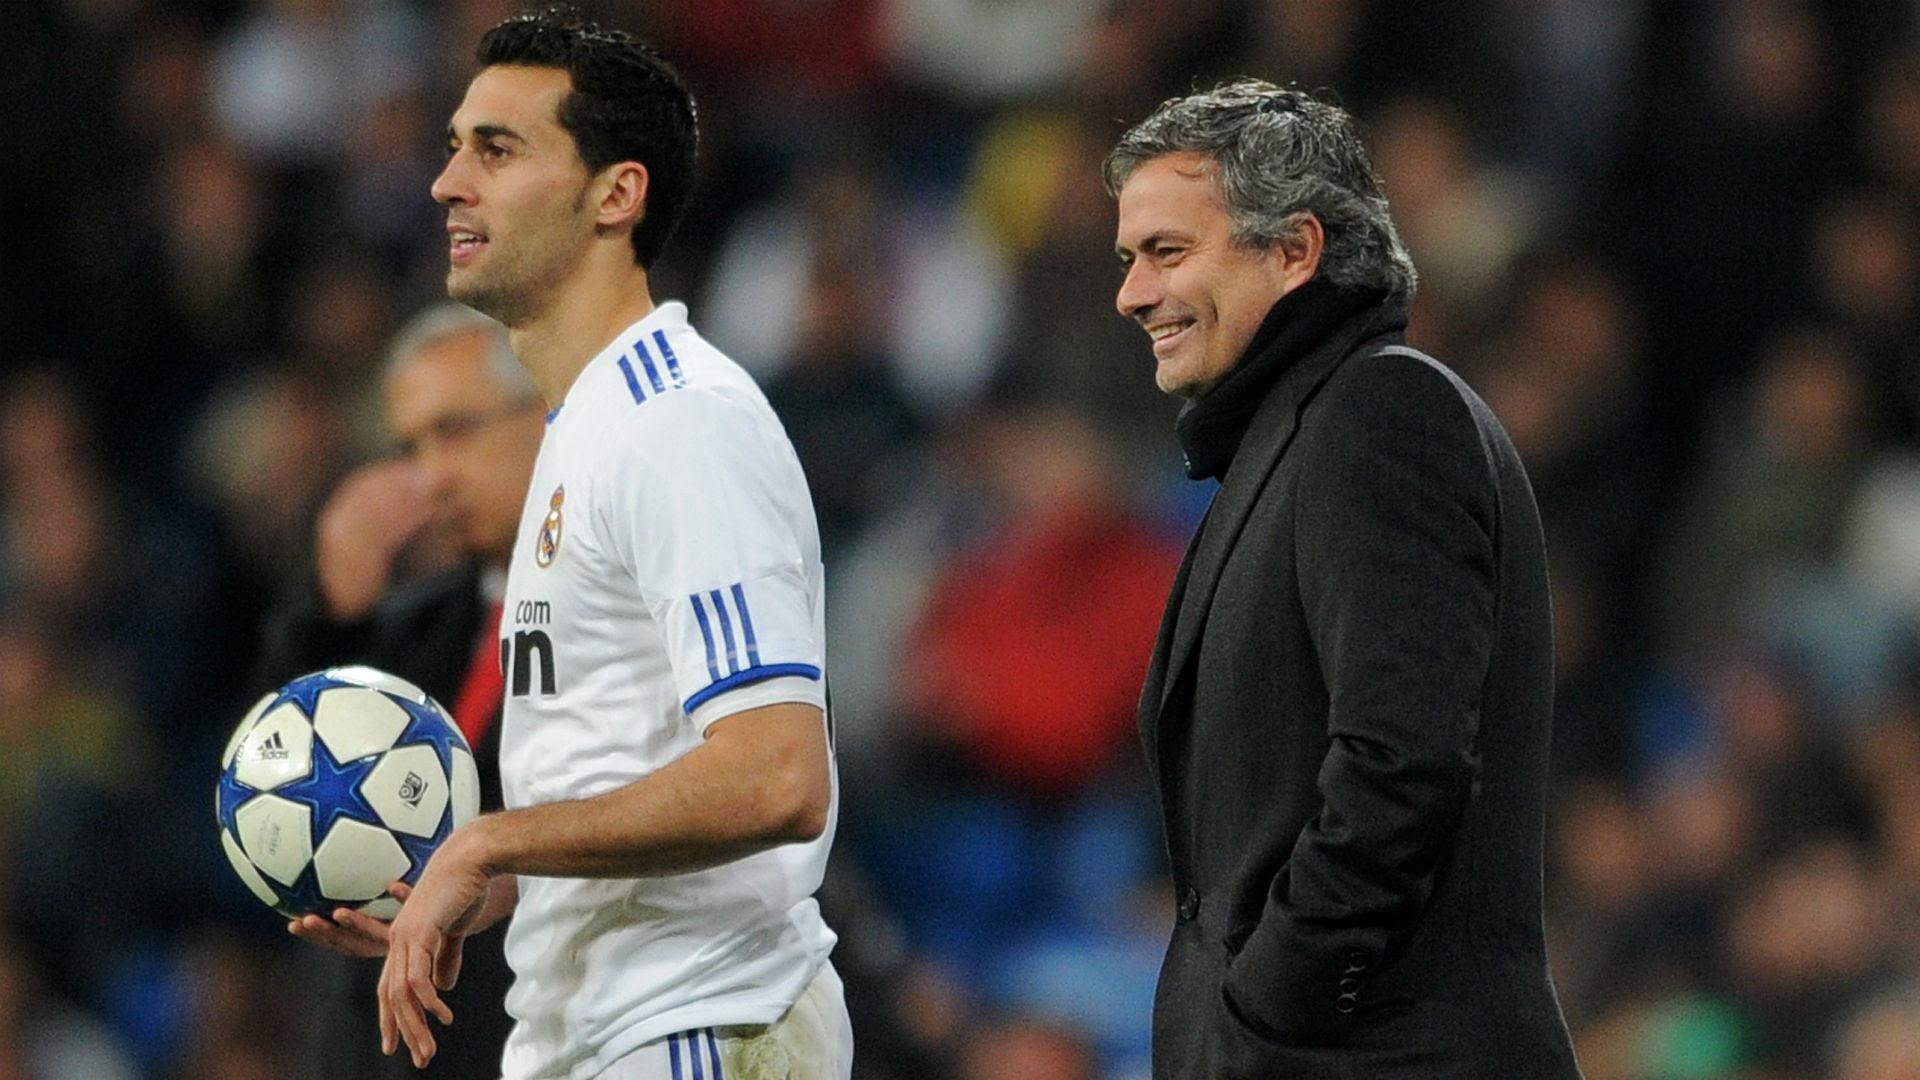 'Mourinho Like A Bullet-Proof Vest'